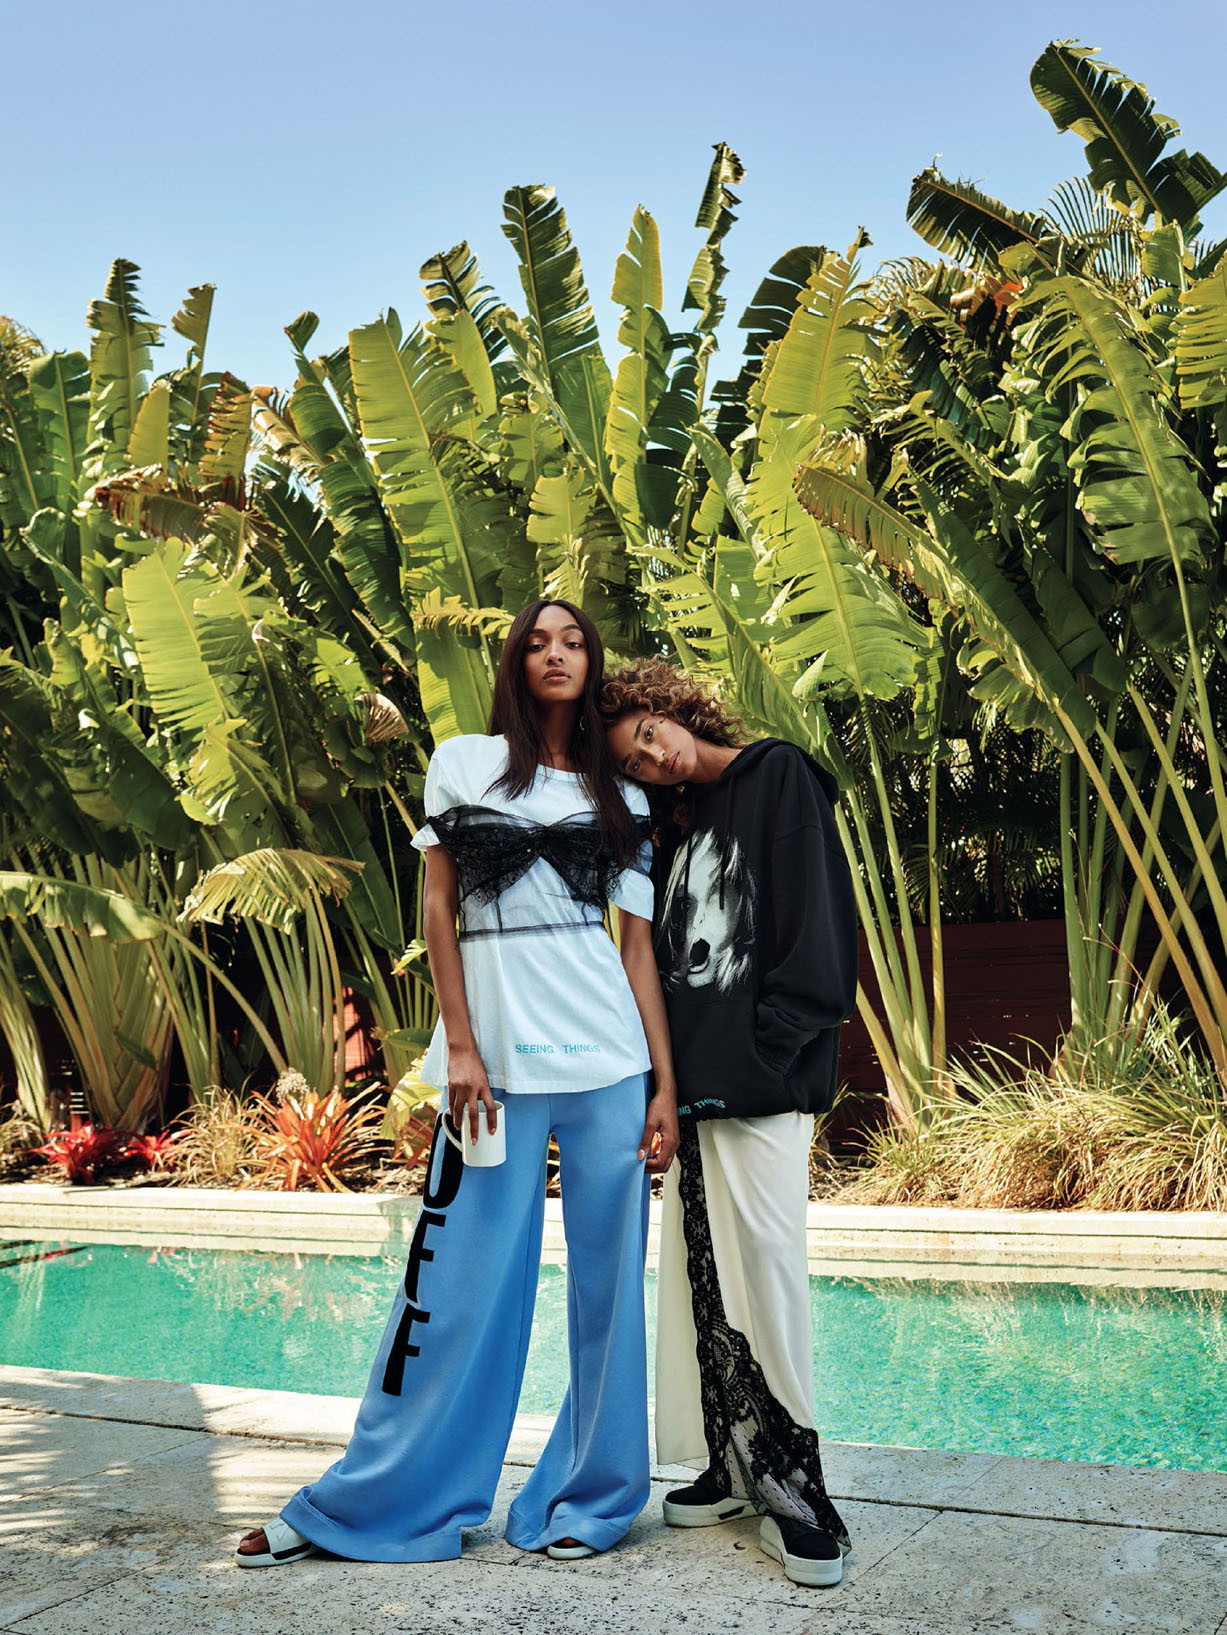 Джордан Данн и Анаис Мали / Anais Mali and Jourdan Dunn by Victor Demarchelier - Glamour US june 2017